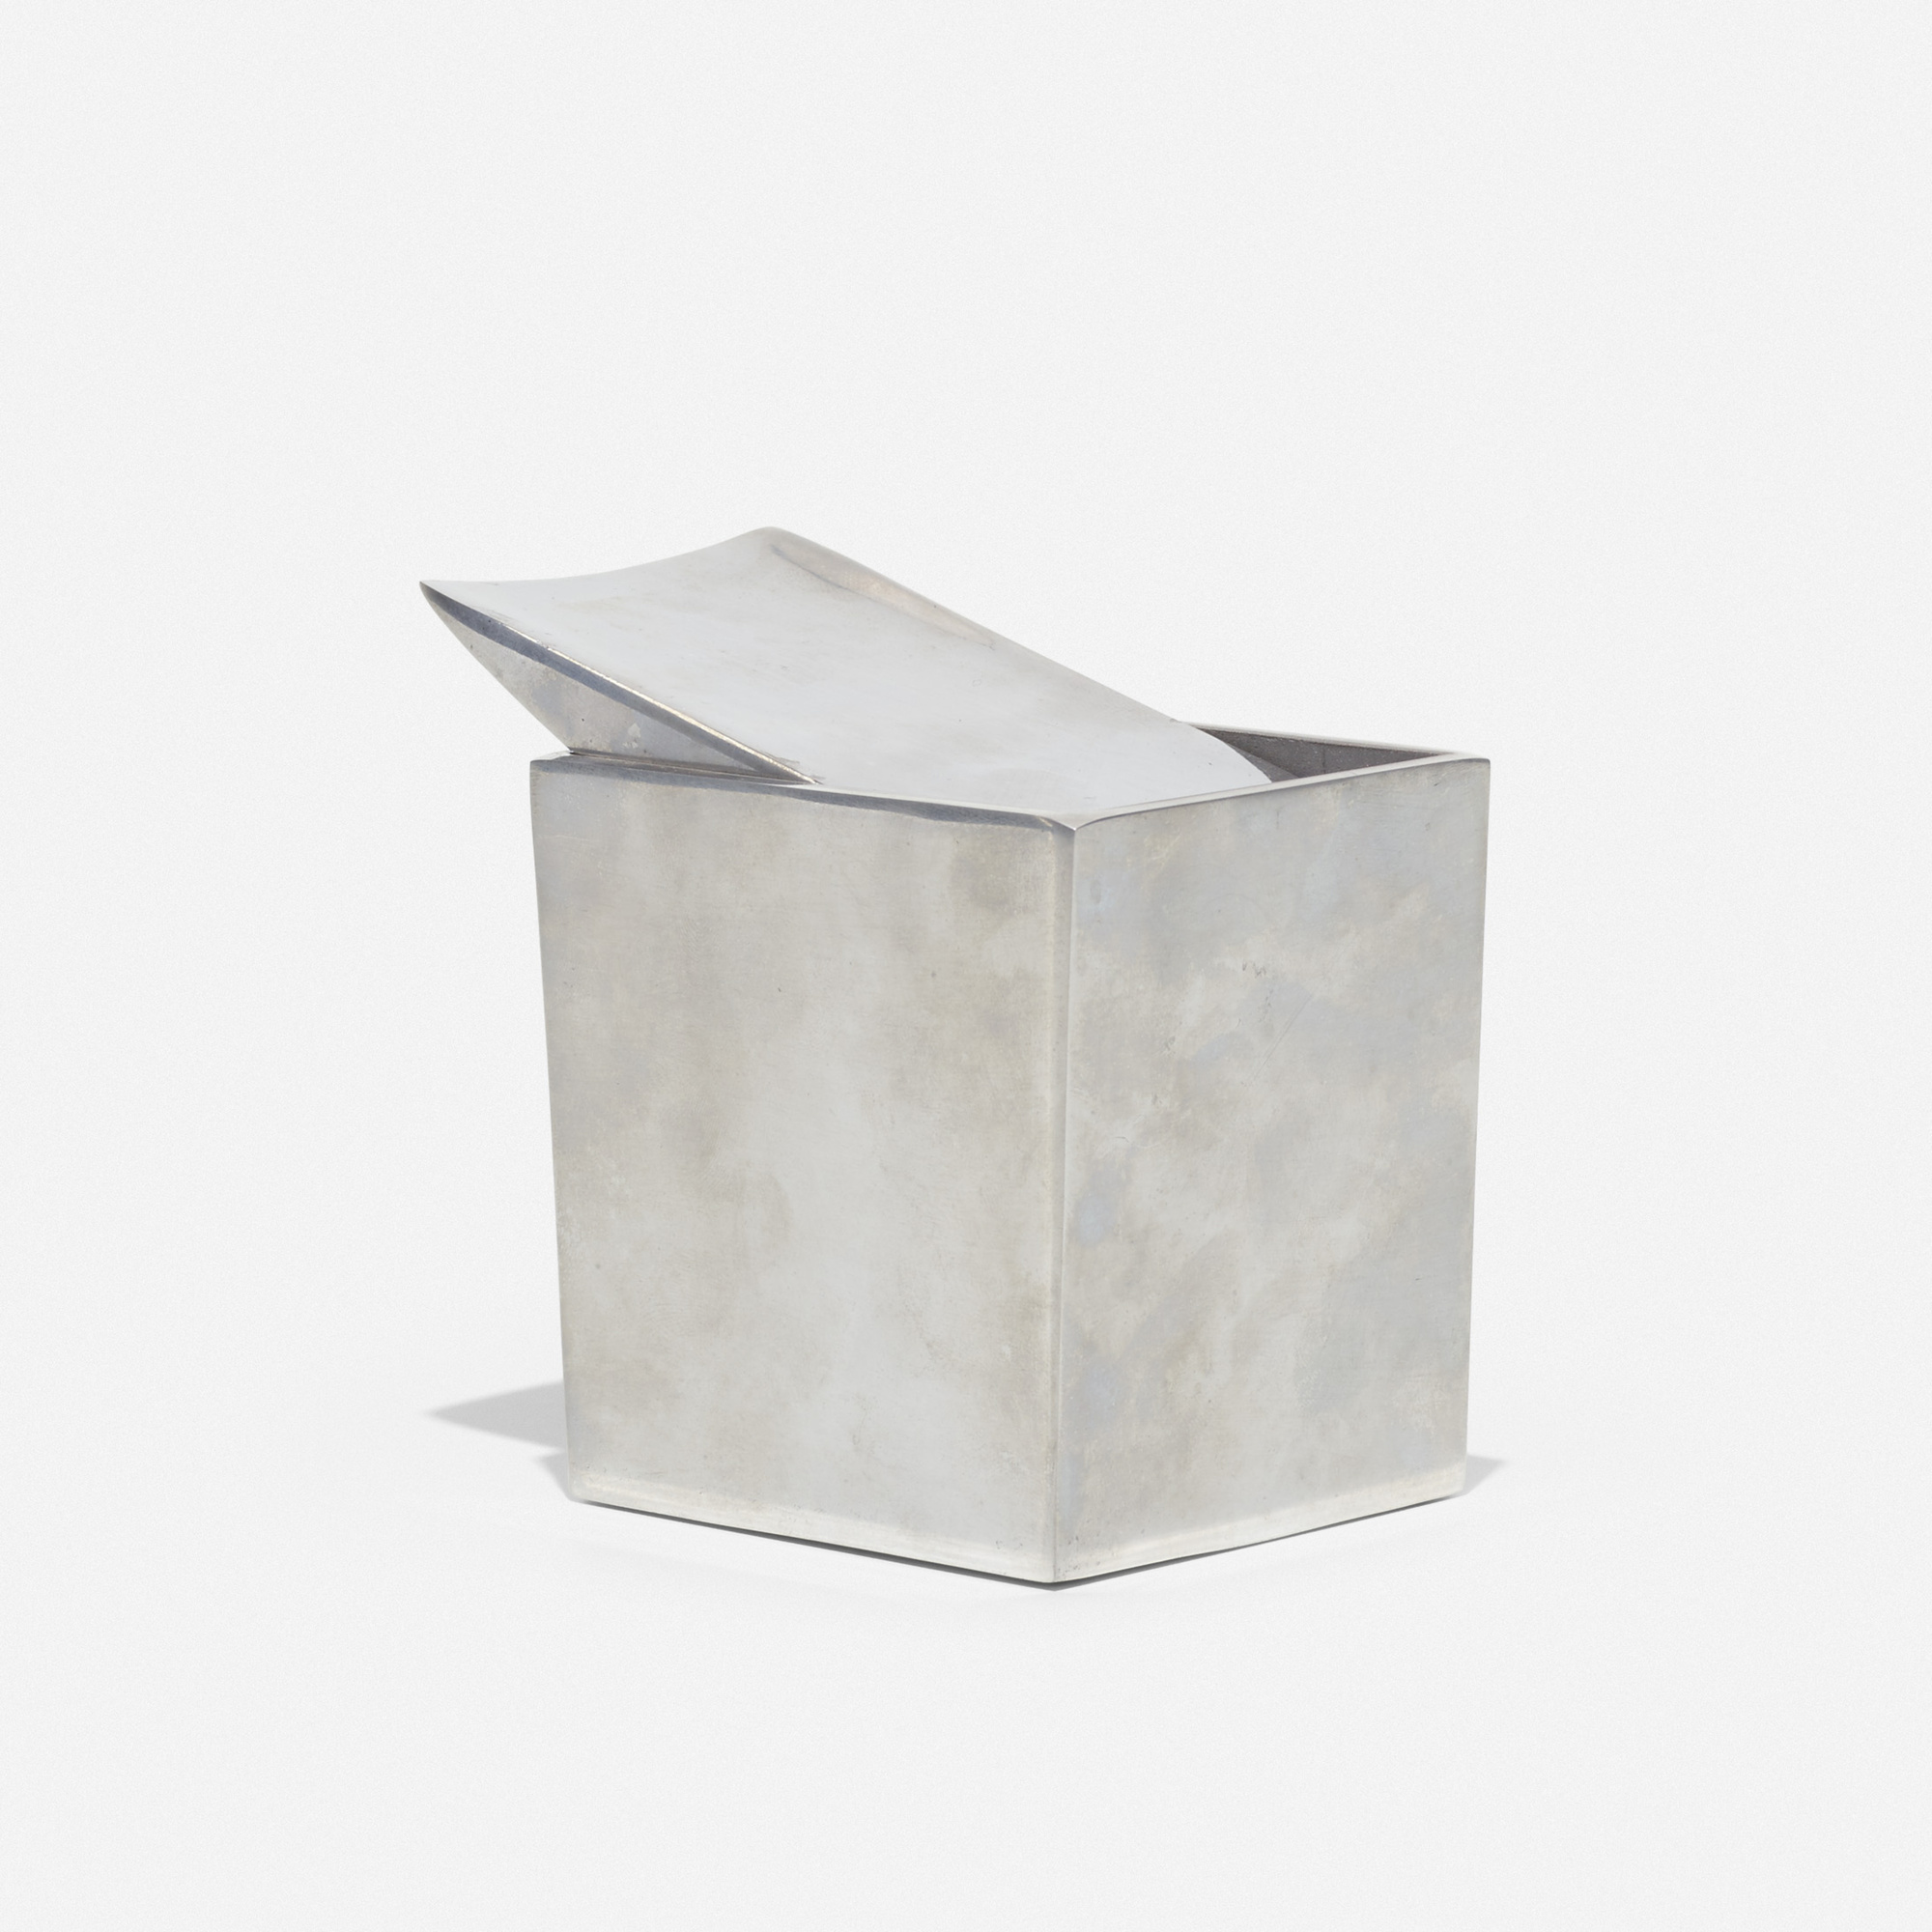 459: Philippe Starck / Ray Hollis ashtray (1 of 2)